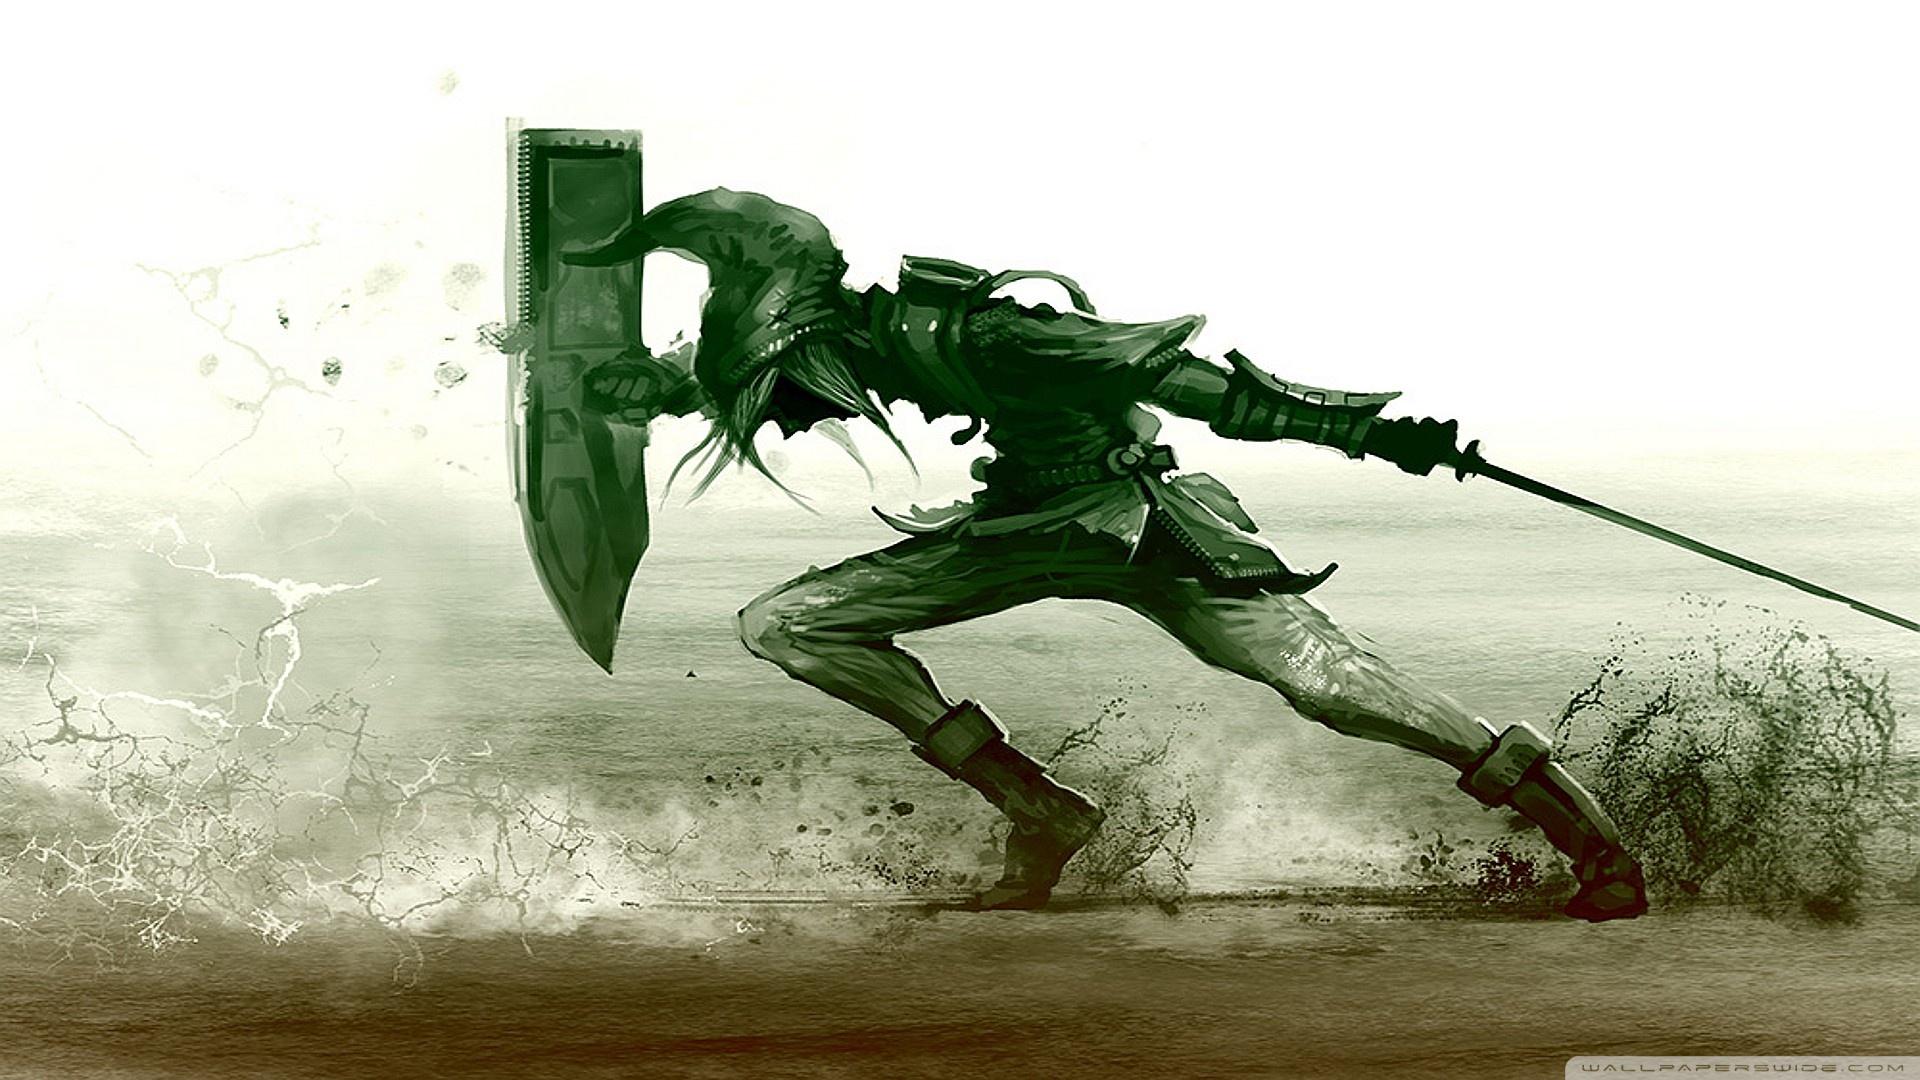 Artwork Digital Art Zelda Link The Legend Of Dirt